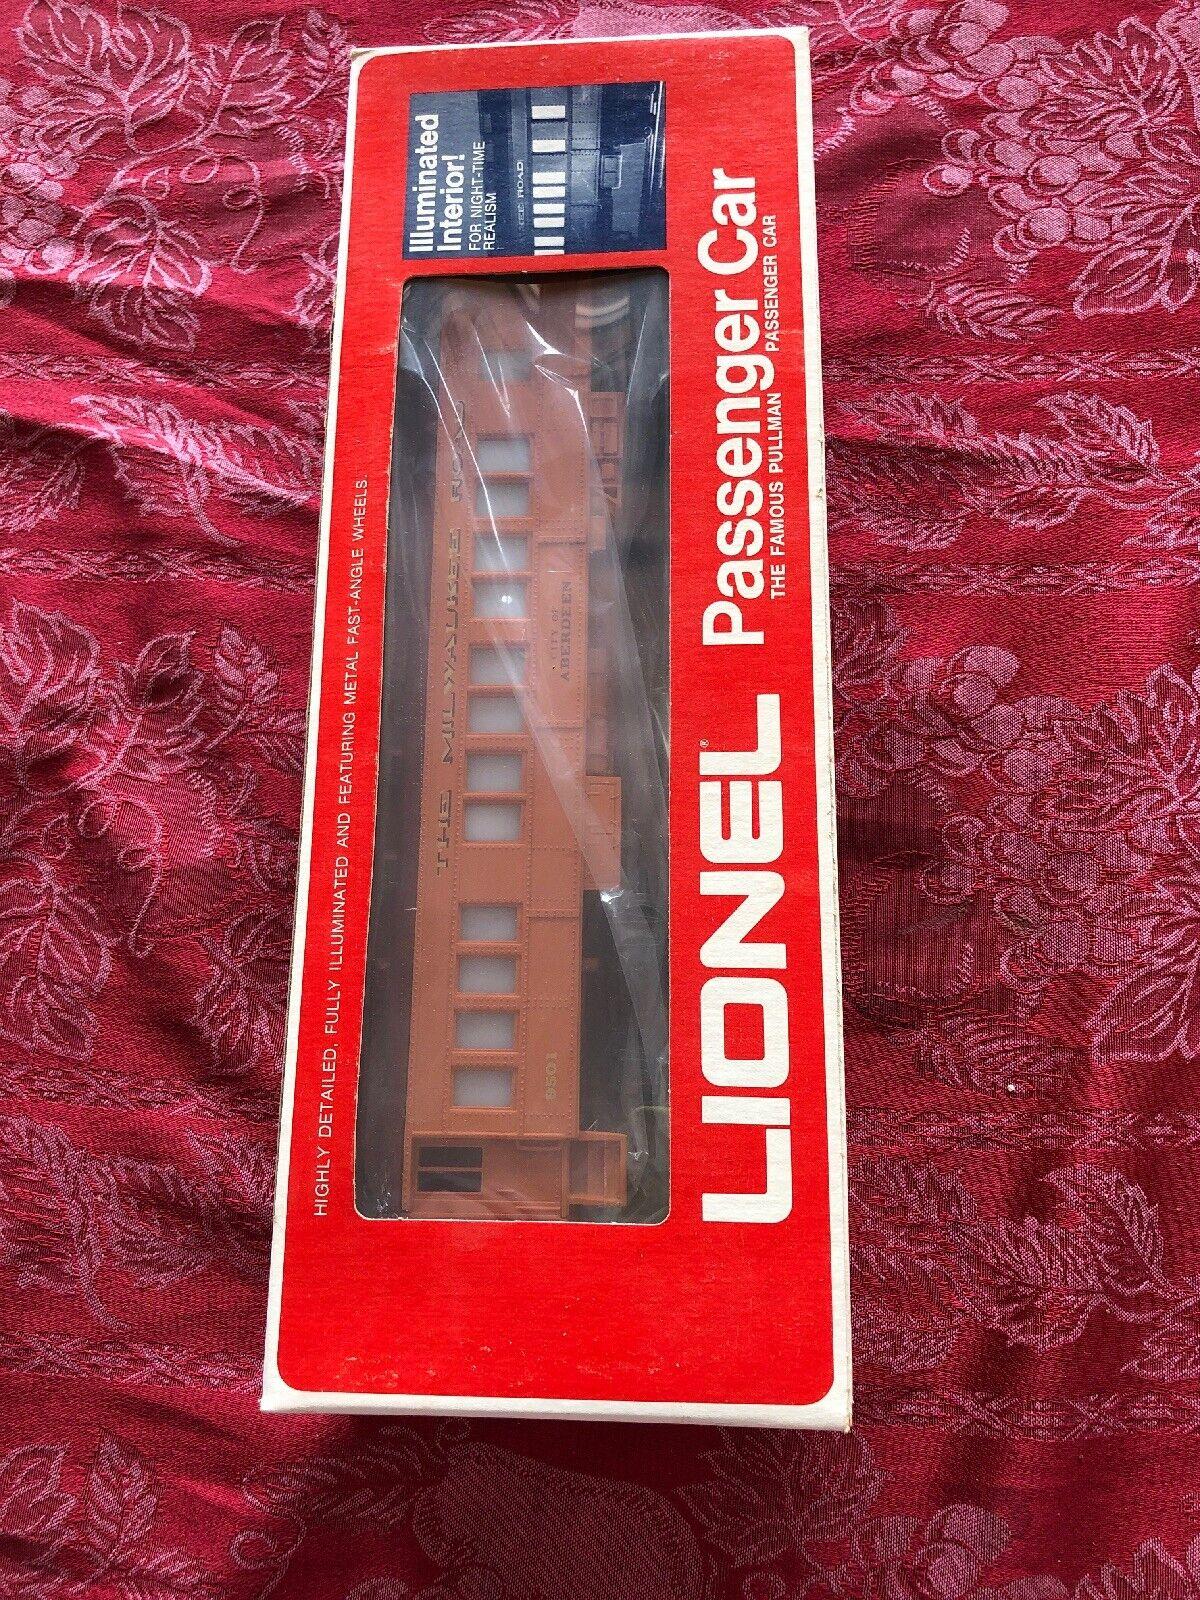 T10 Lionel O Scale Illuminated Milwaukee Aberdeen Passenger Car 9501 New